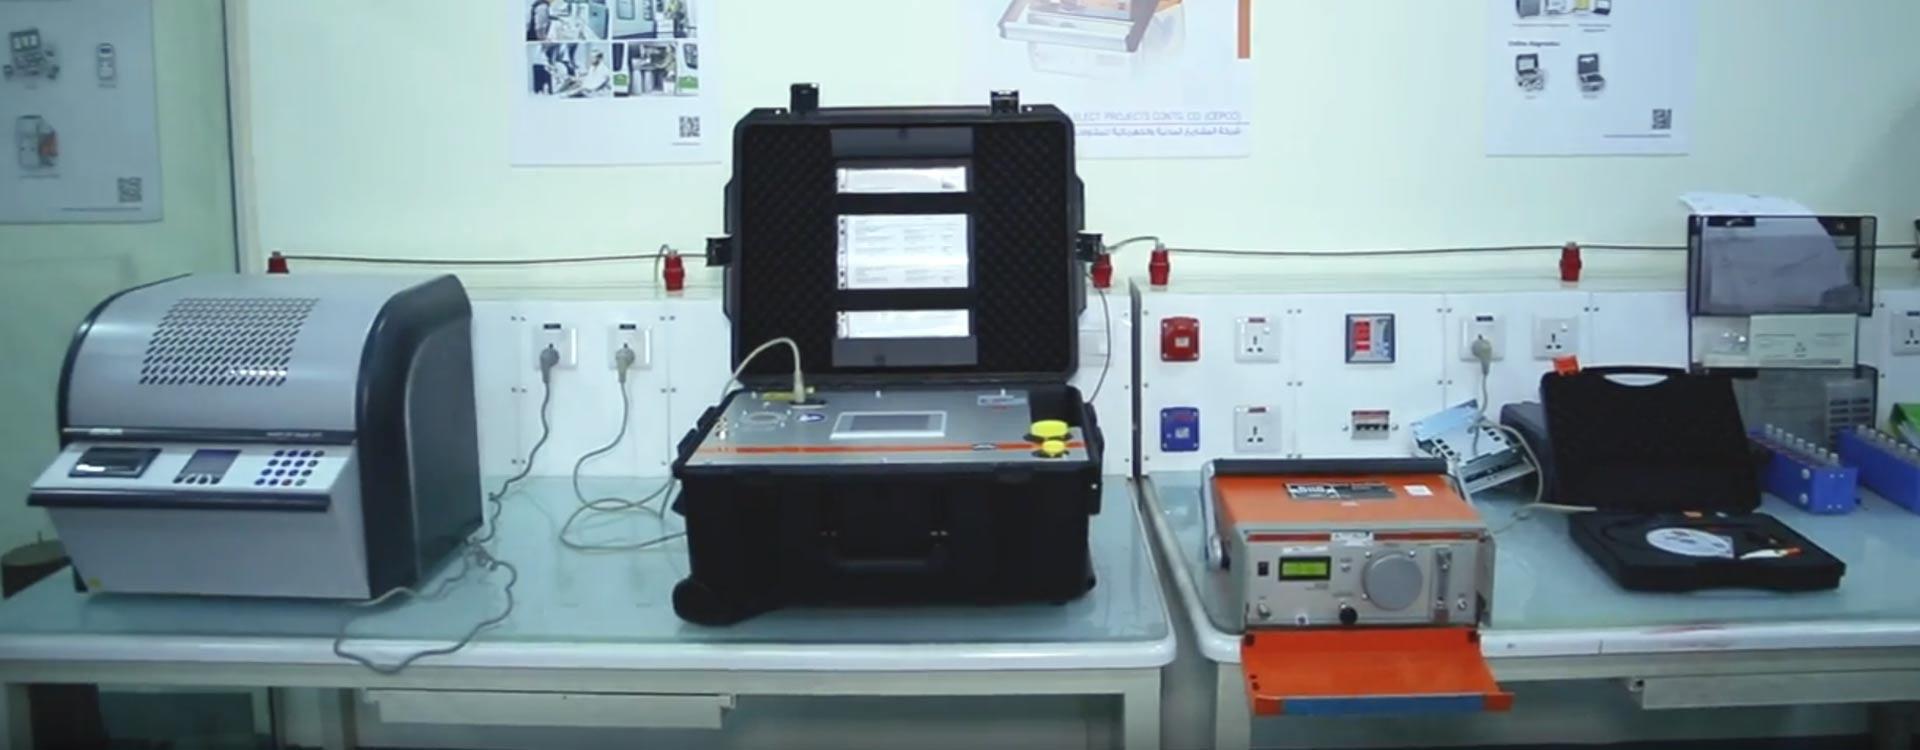 Electrical Test Equipment Maintenance Services Saudi Arabia